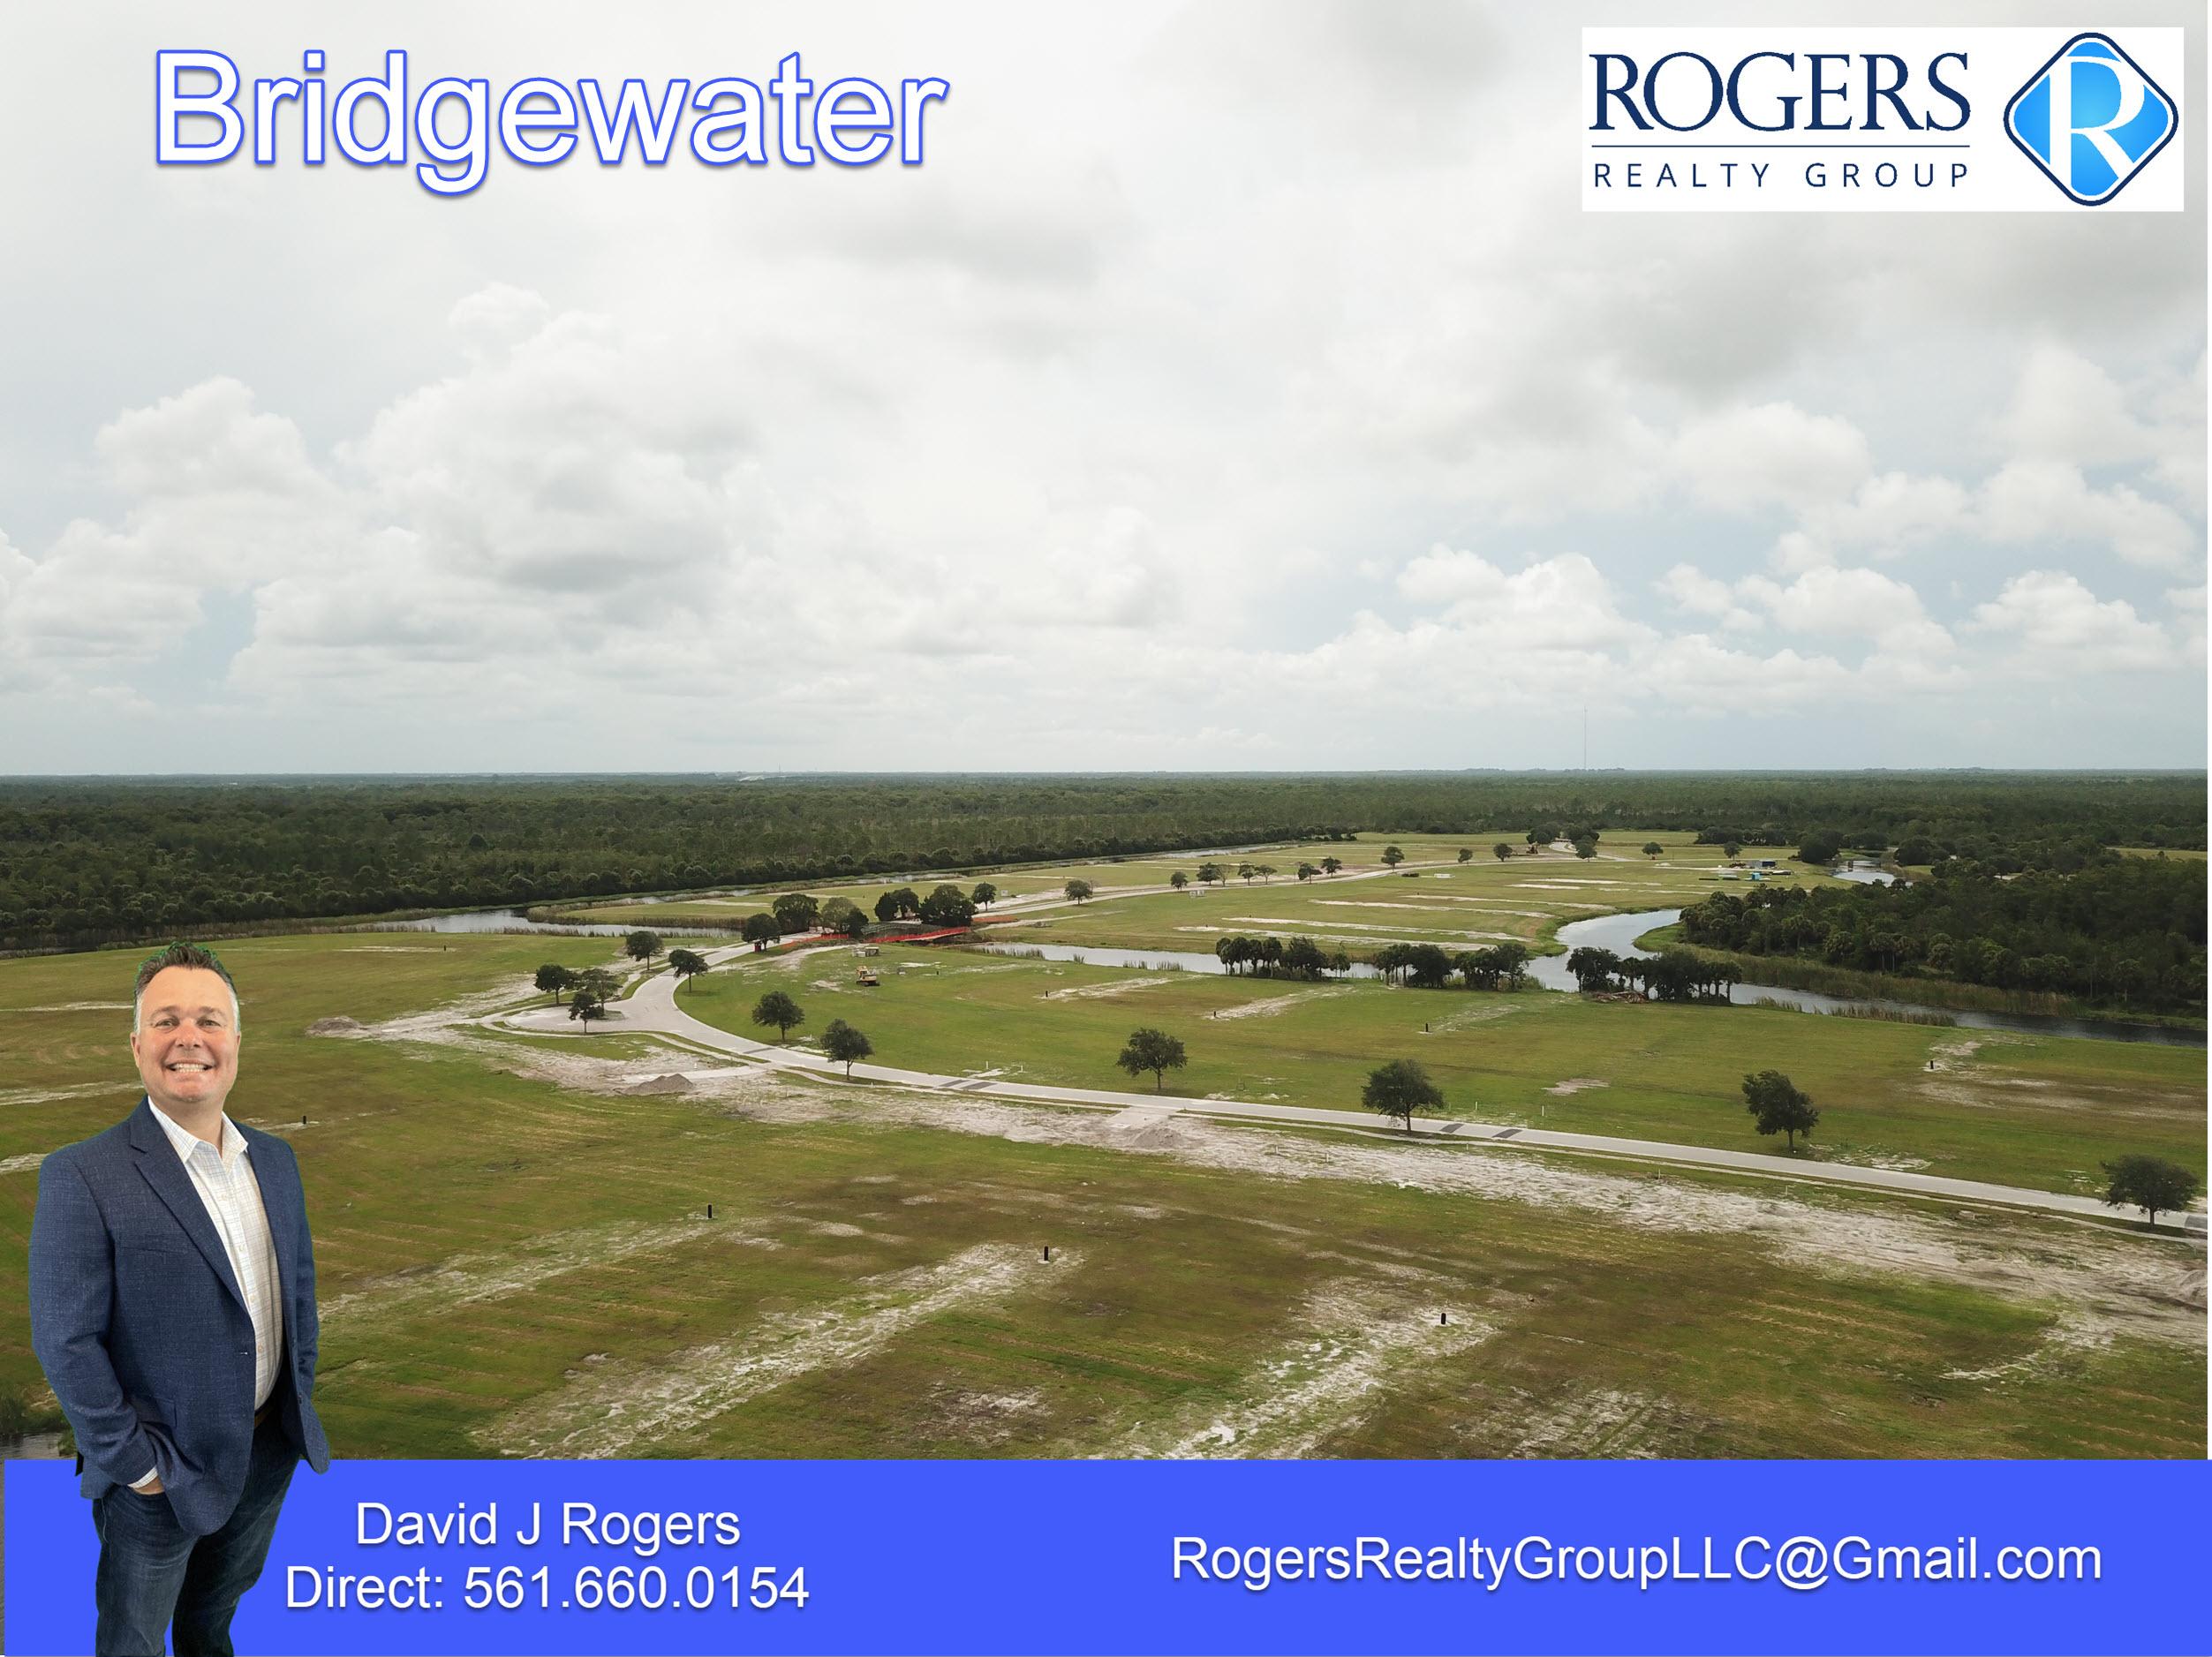 aerial view of bridgewater nieghborhood jupiter florida facing northwest towards stuart fl